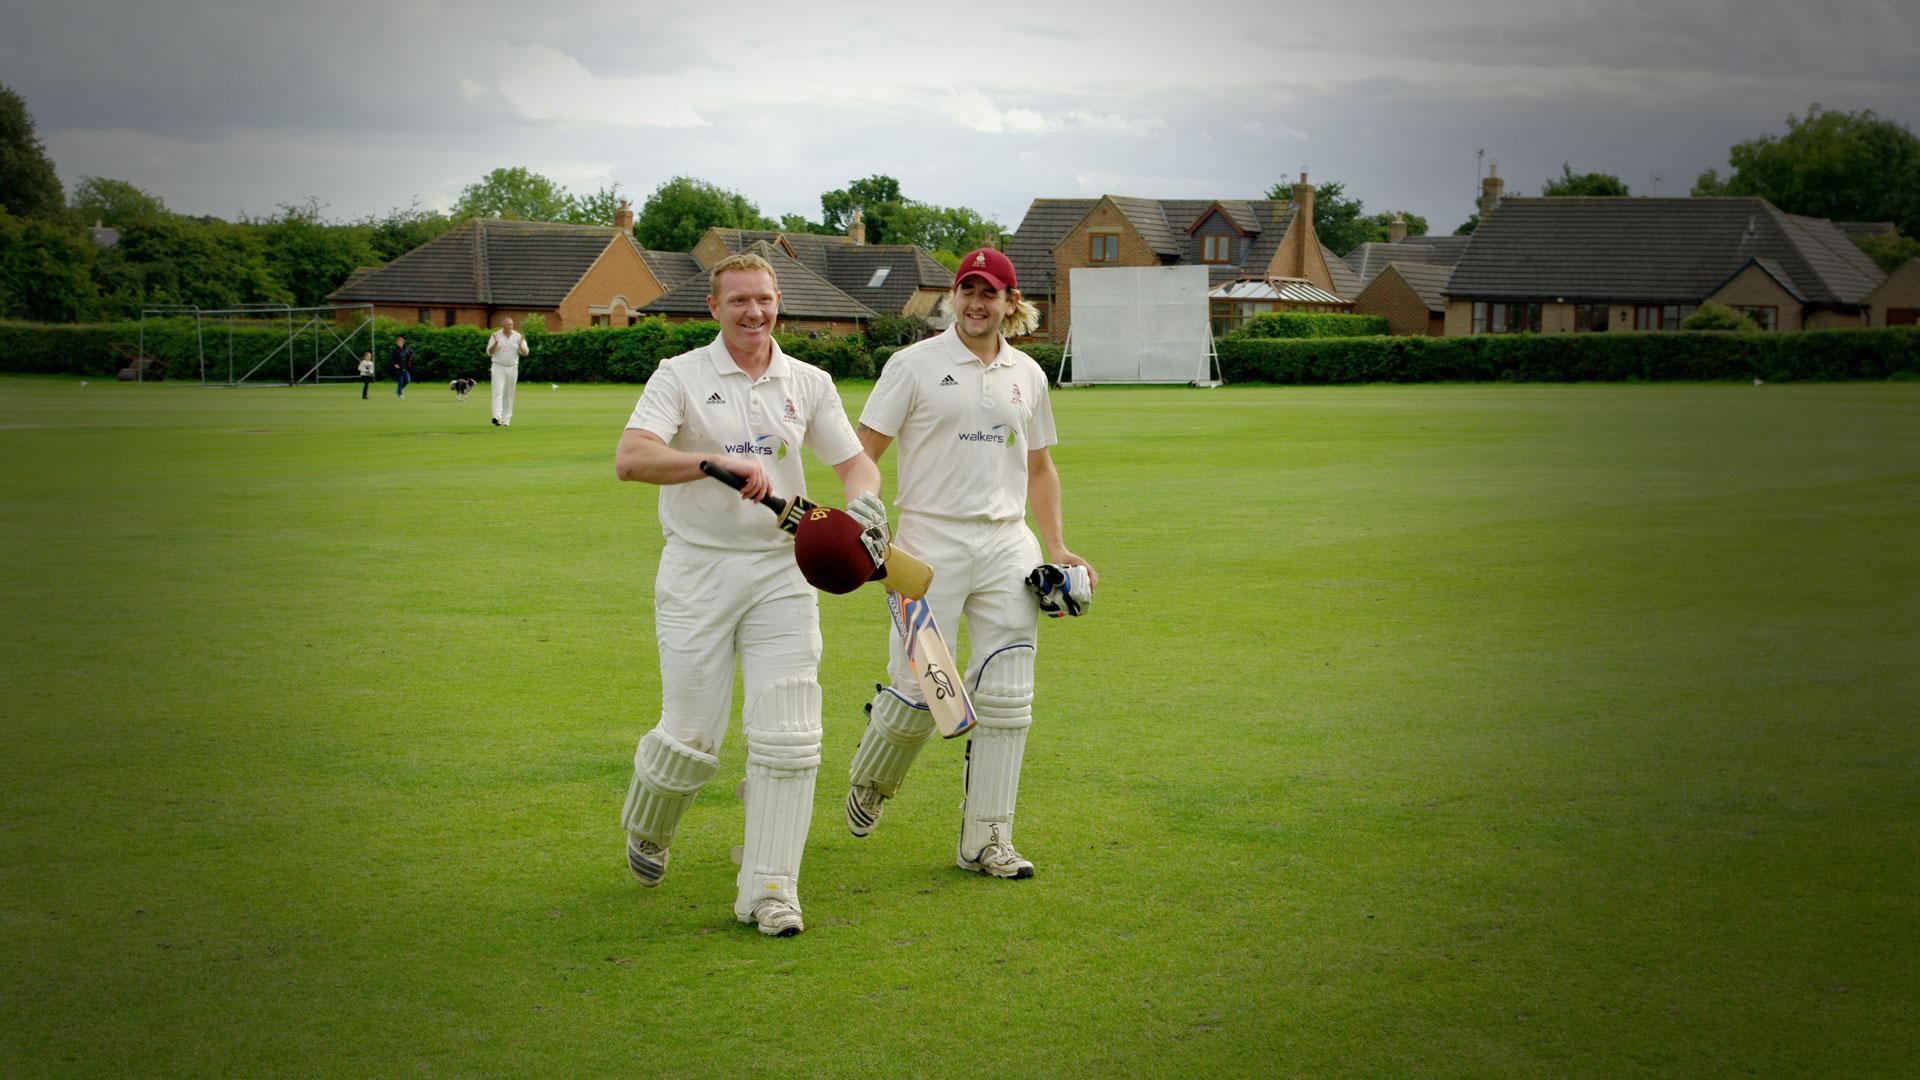 ilkley-cricket-club-champions.jpg